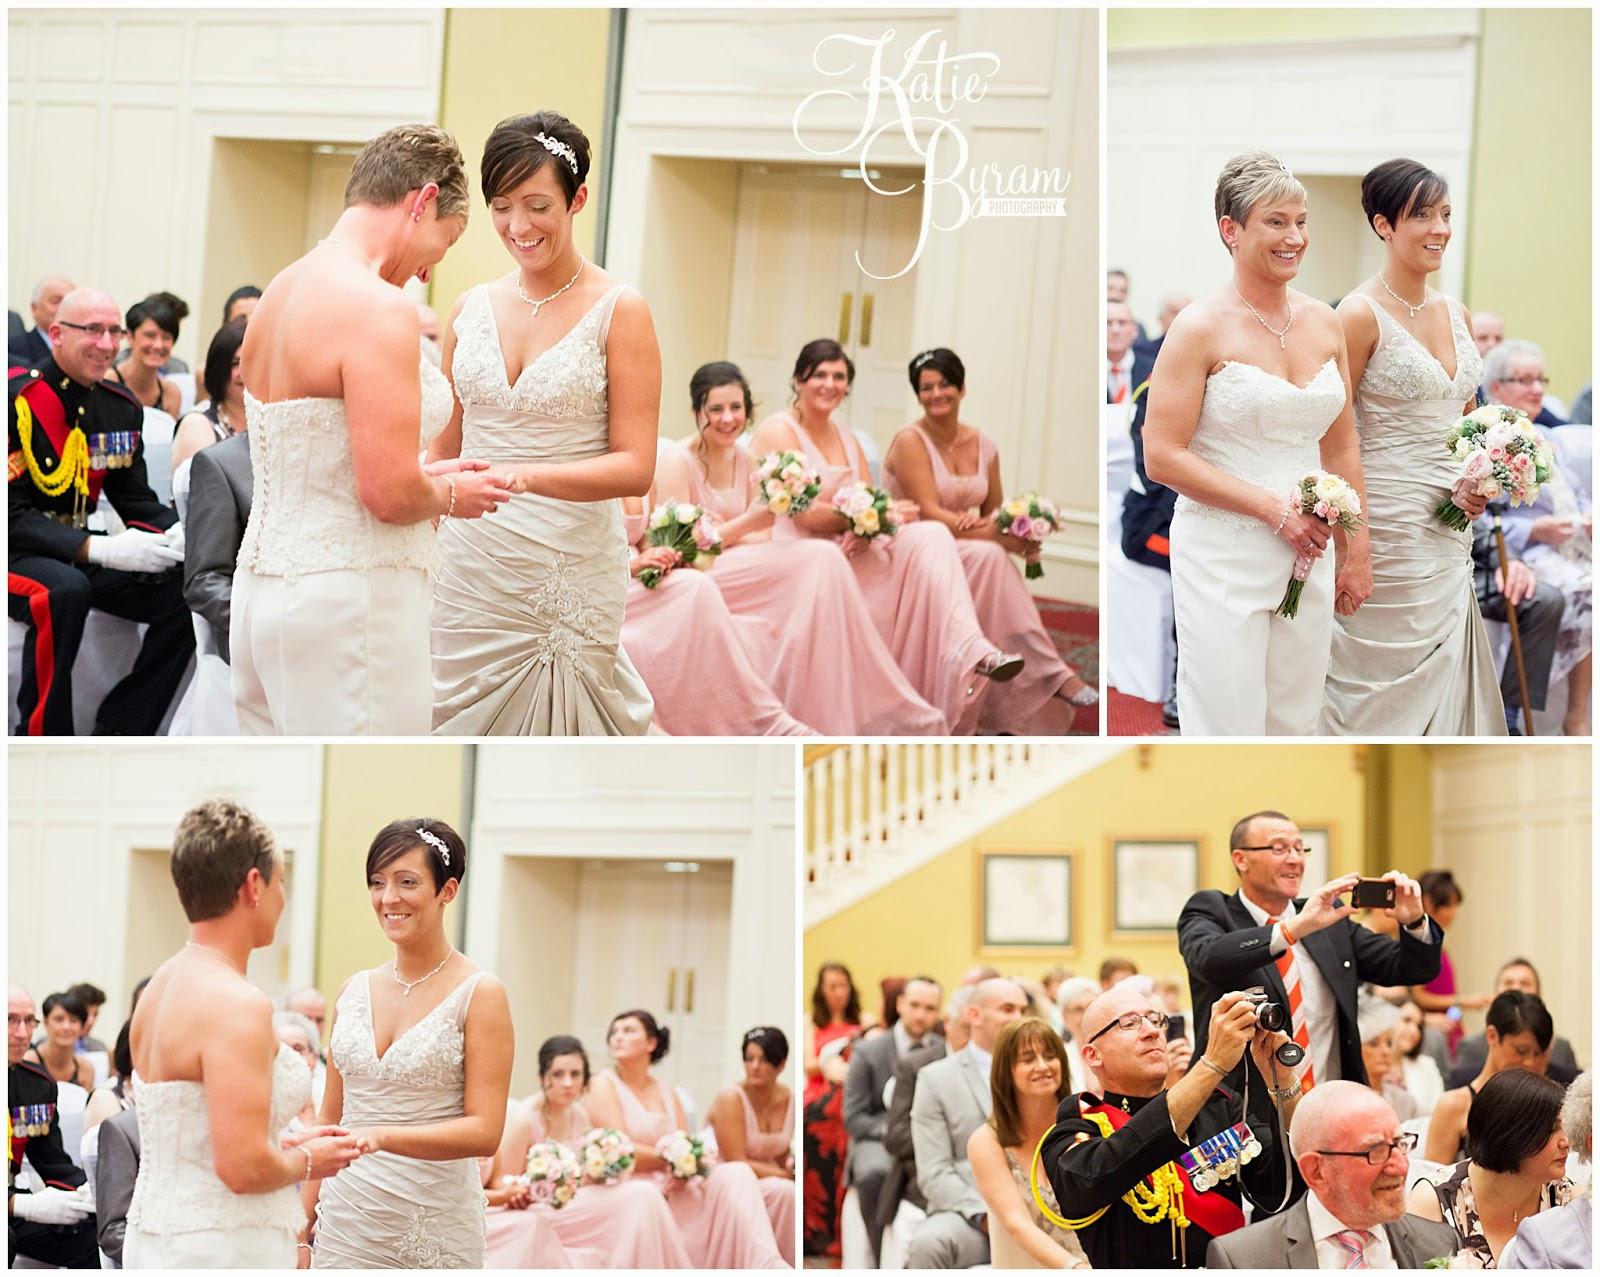 two bride wedding, lesbian wedding, lgbt wedding, gisborough hall wedding, north yorkshire wedding photographer, katie byram photographer, same-sex couples, bex bridal, elizabeth george bridal, north yorkshire wedding venues